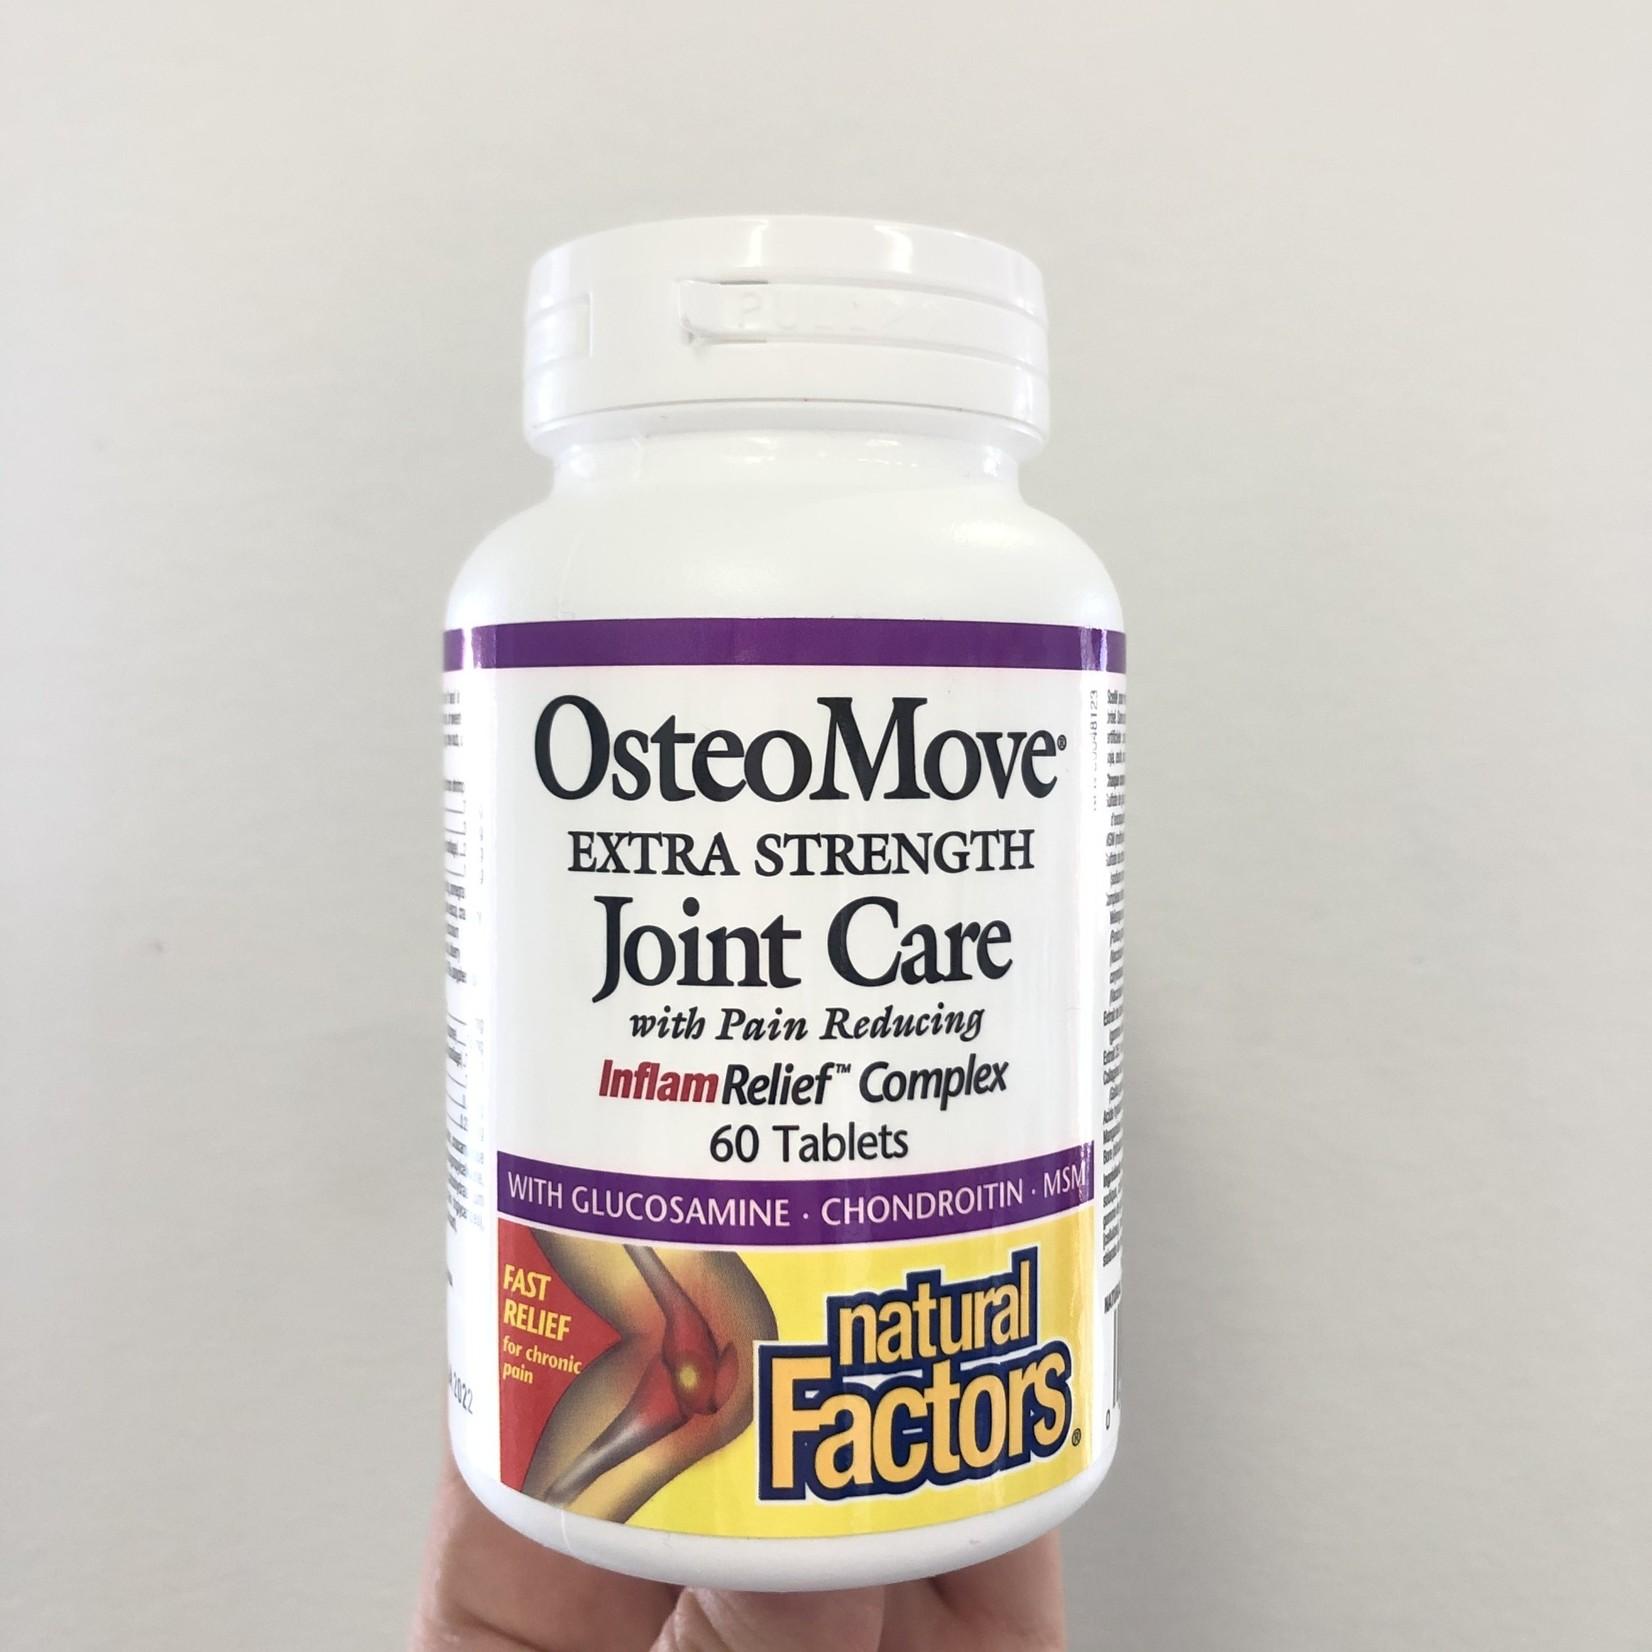 Natural Factors Natural Factors OsteoMove Joint Care 60 tabs